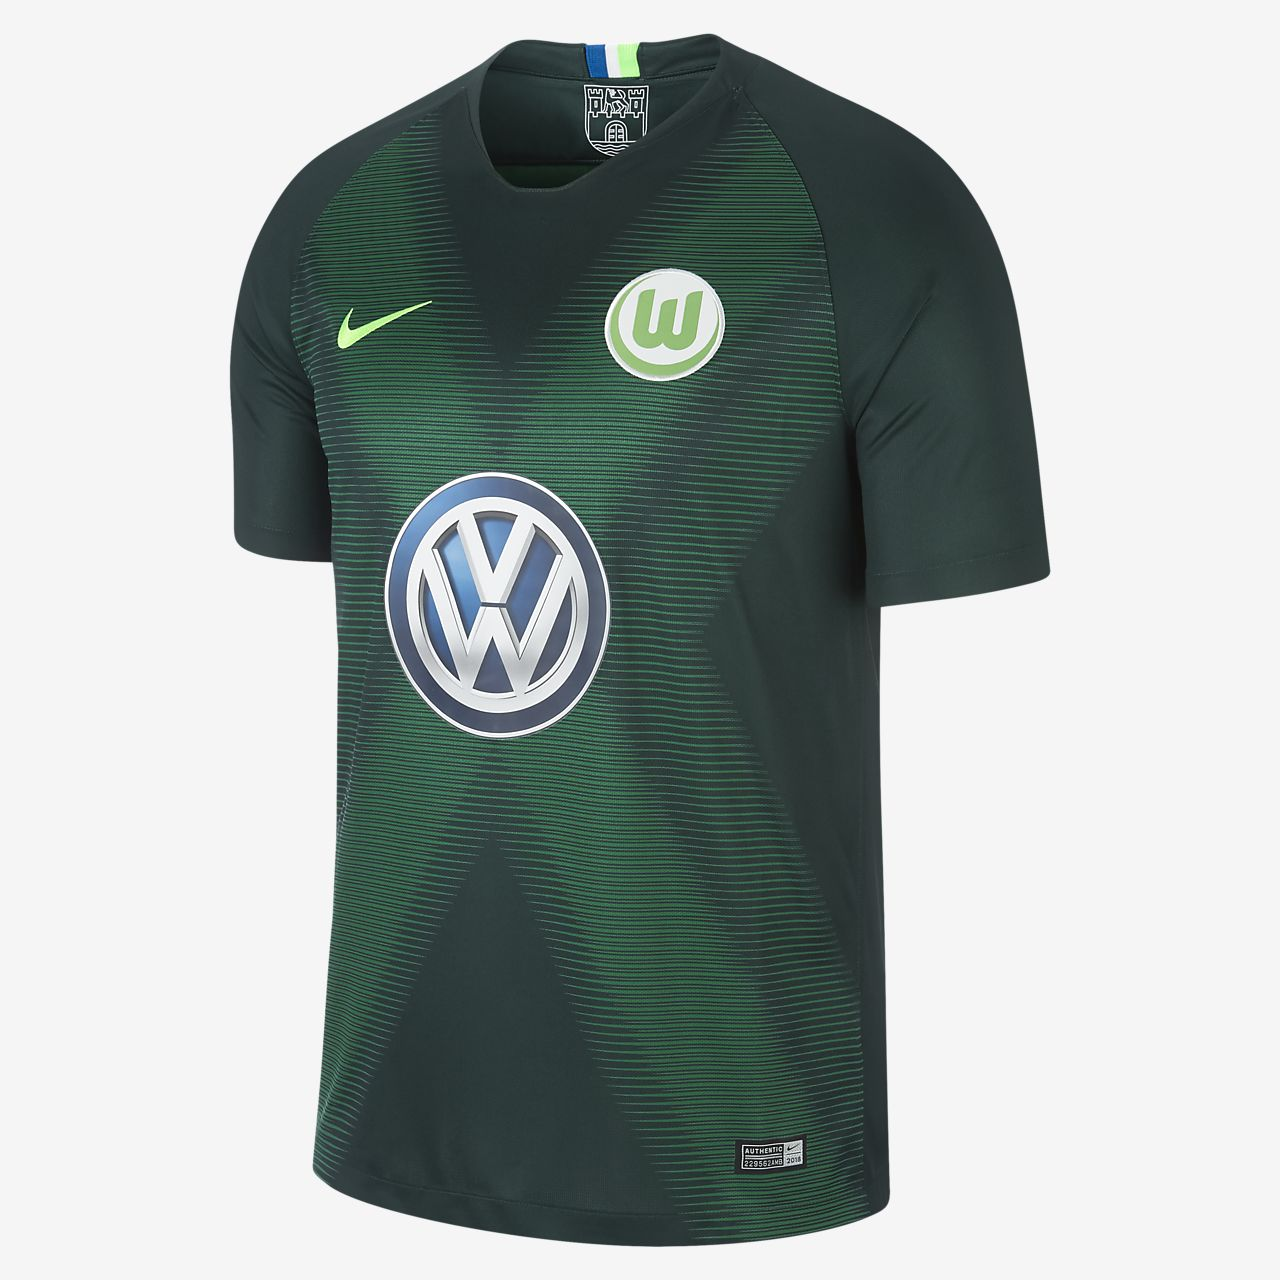 Camiseta de fútbol para hombre 2018 19 VfL Wolfsburg Stadium. Nike ... b52281011aac1